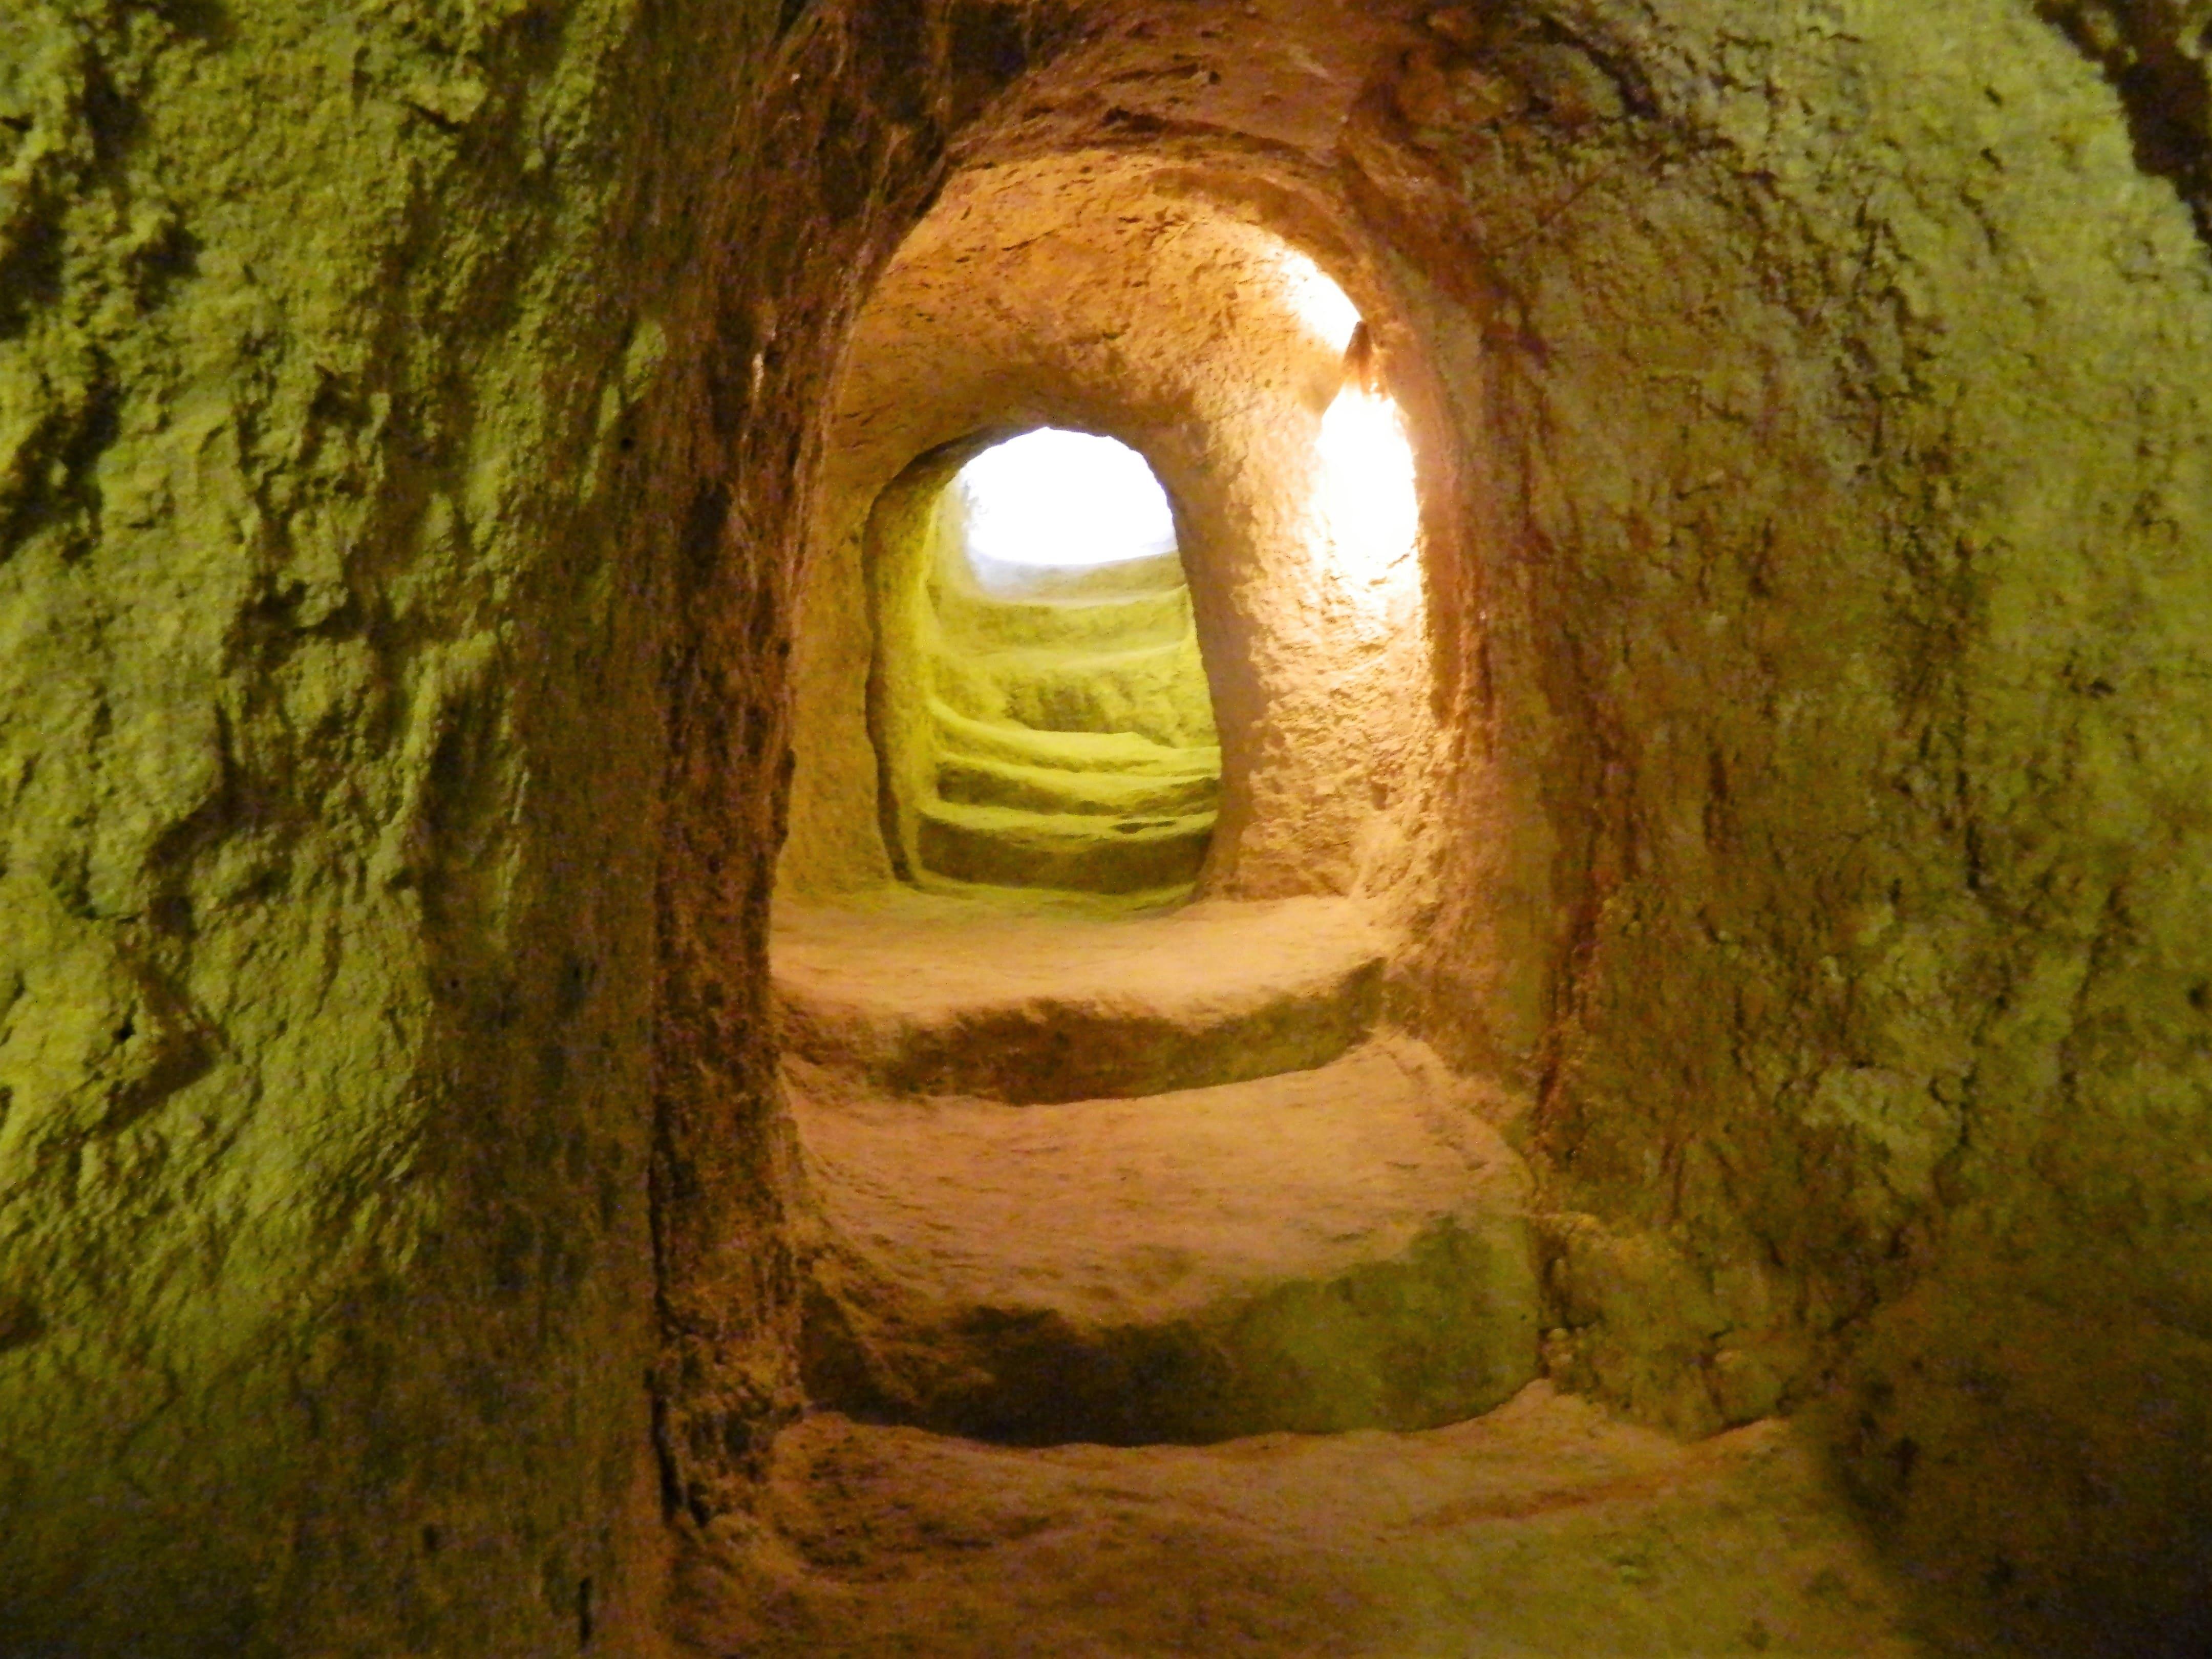 Alcala_la_real_mota_andalusia_tunnel